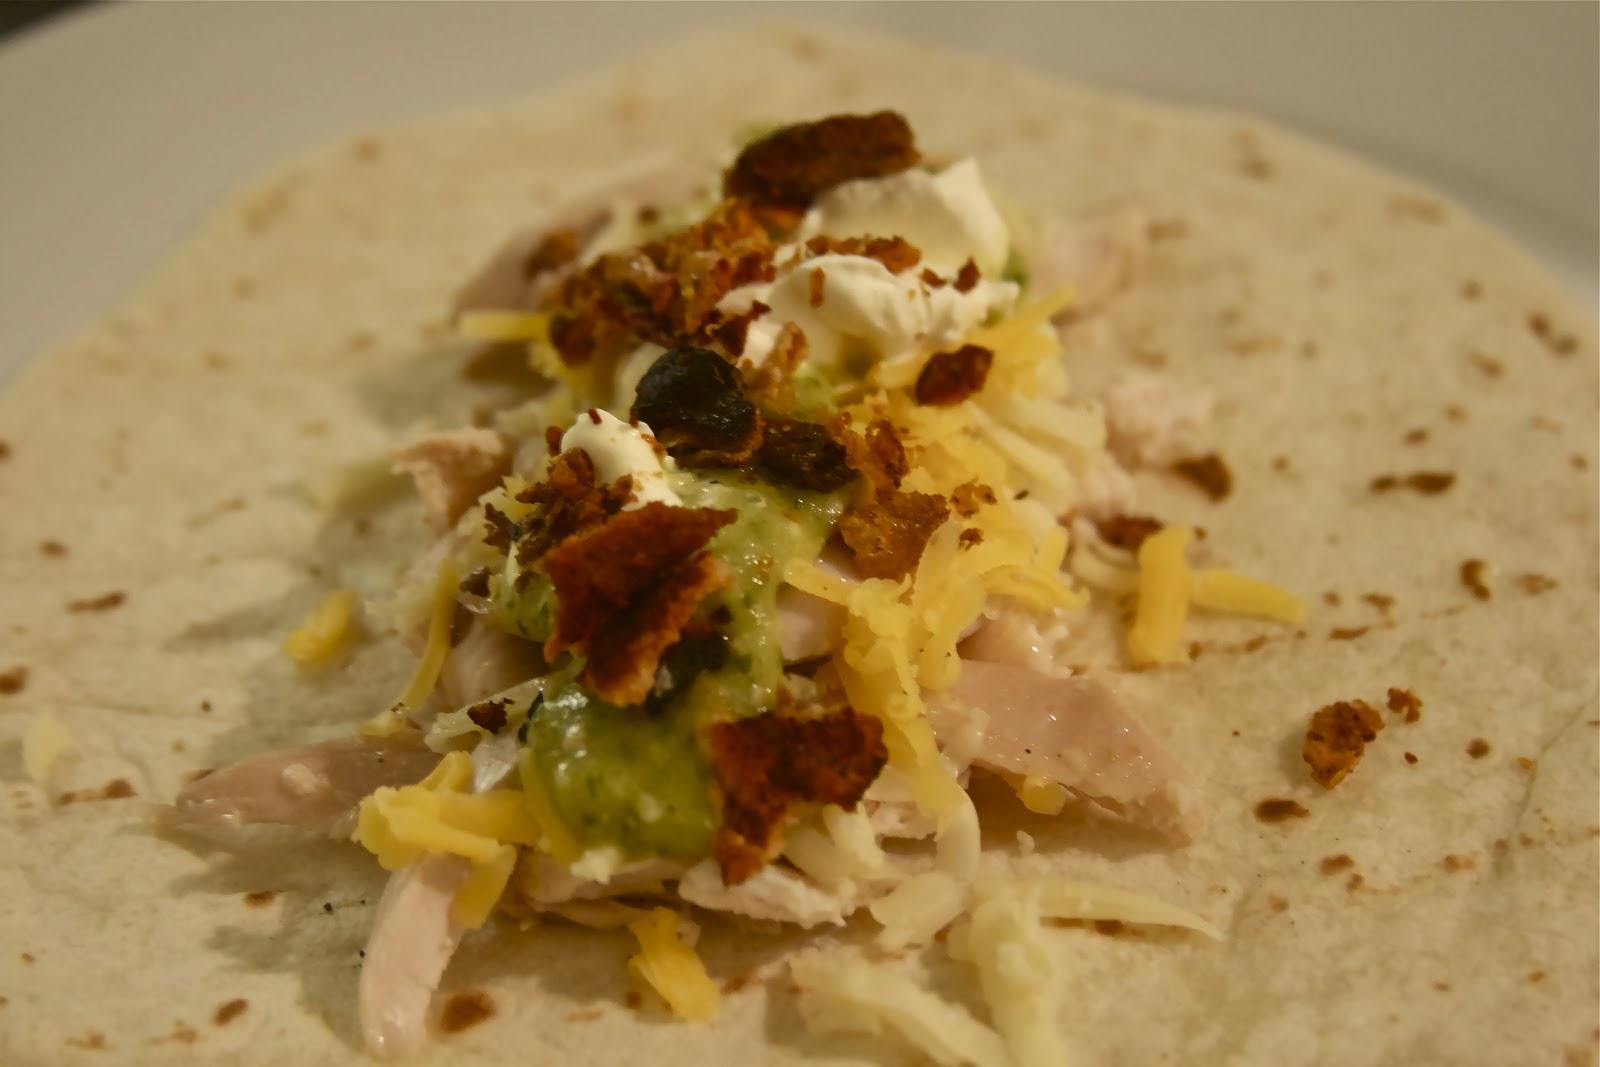 Crispy Chicken Skin Tacos With Habanero Salsa Recipes — Dishmaps